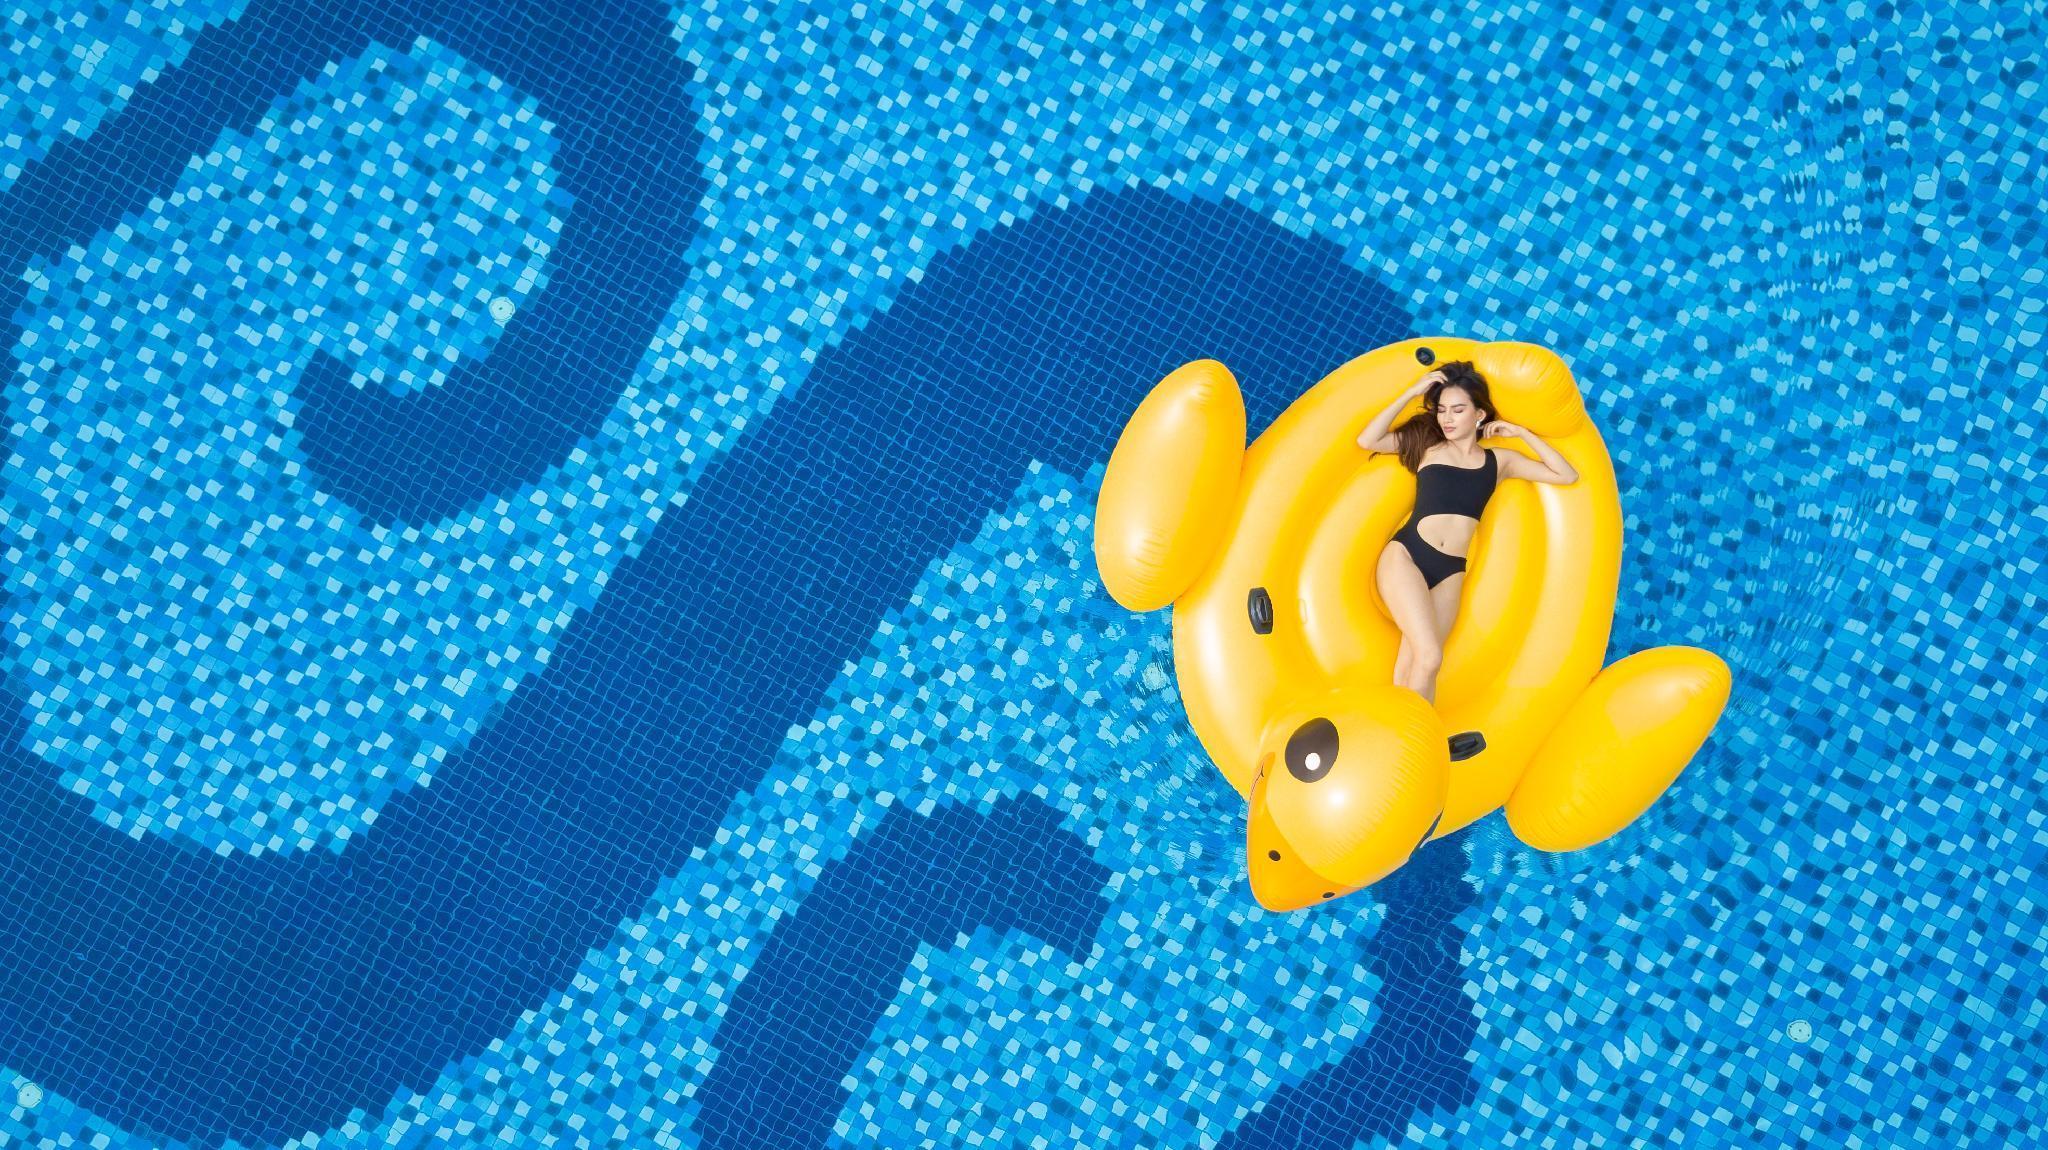 The Senses Resort & Pool Villas Phuket เดอะ เซนส์ รีสอร์ต แอนด์ พูลวิลลา ภูเก็ต